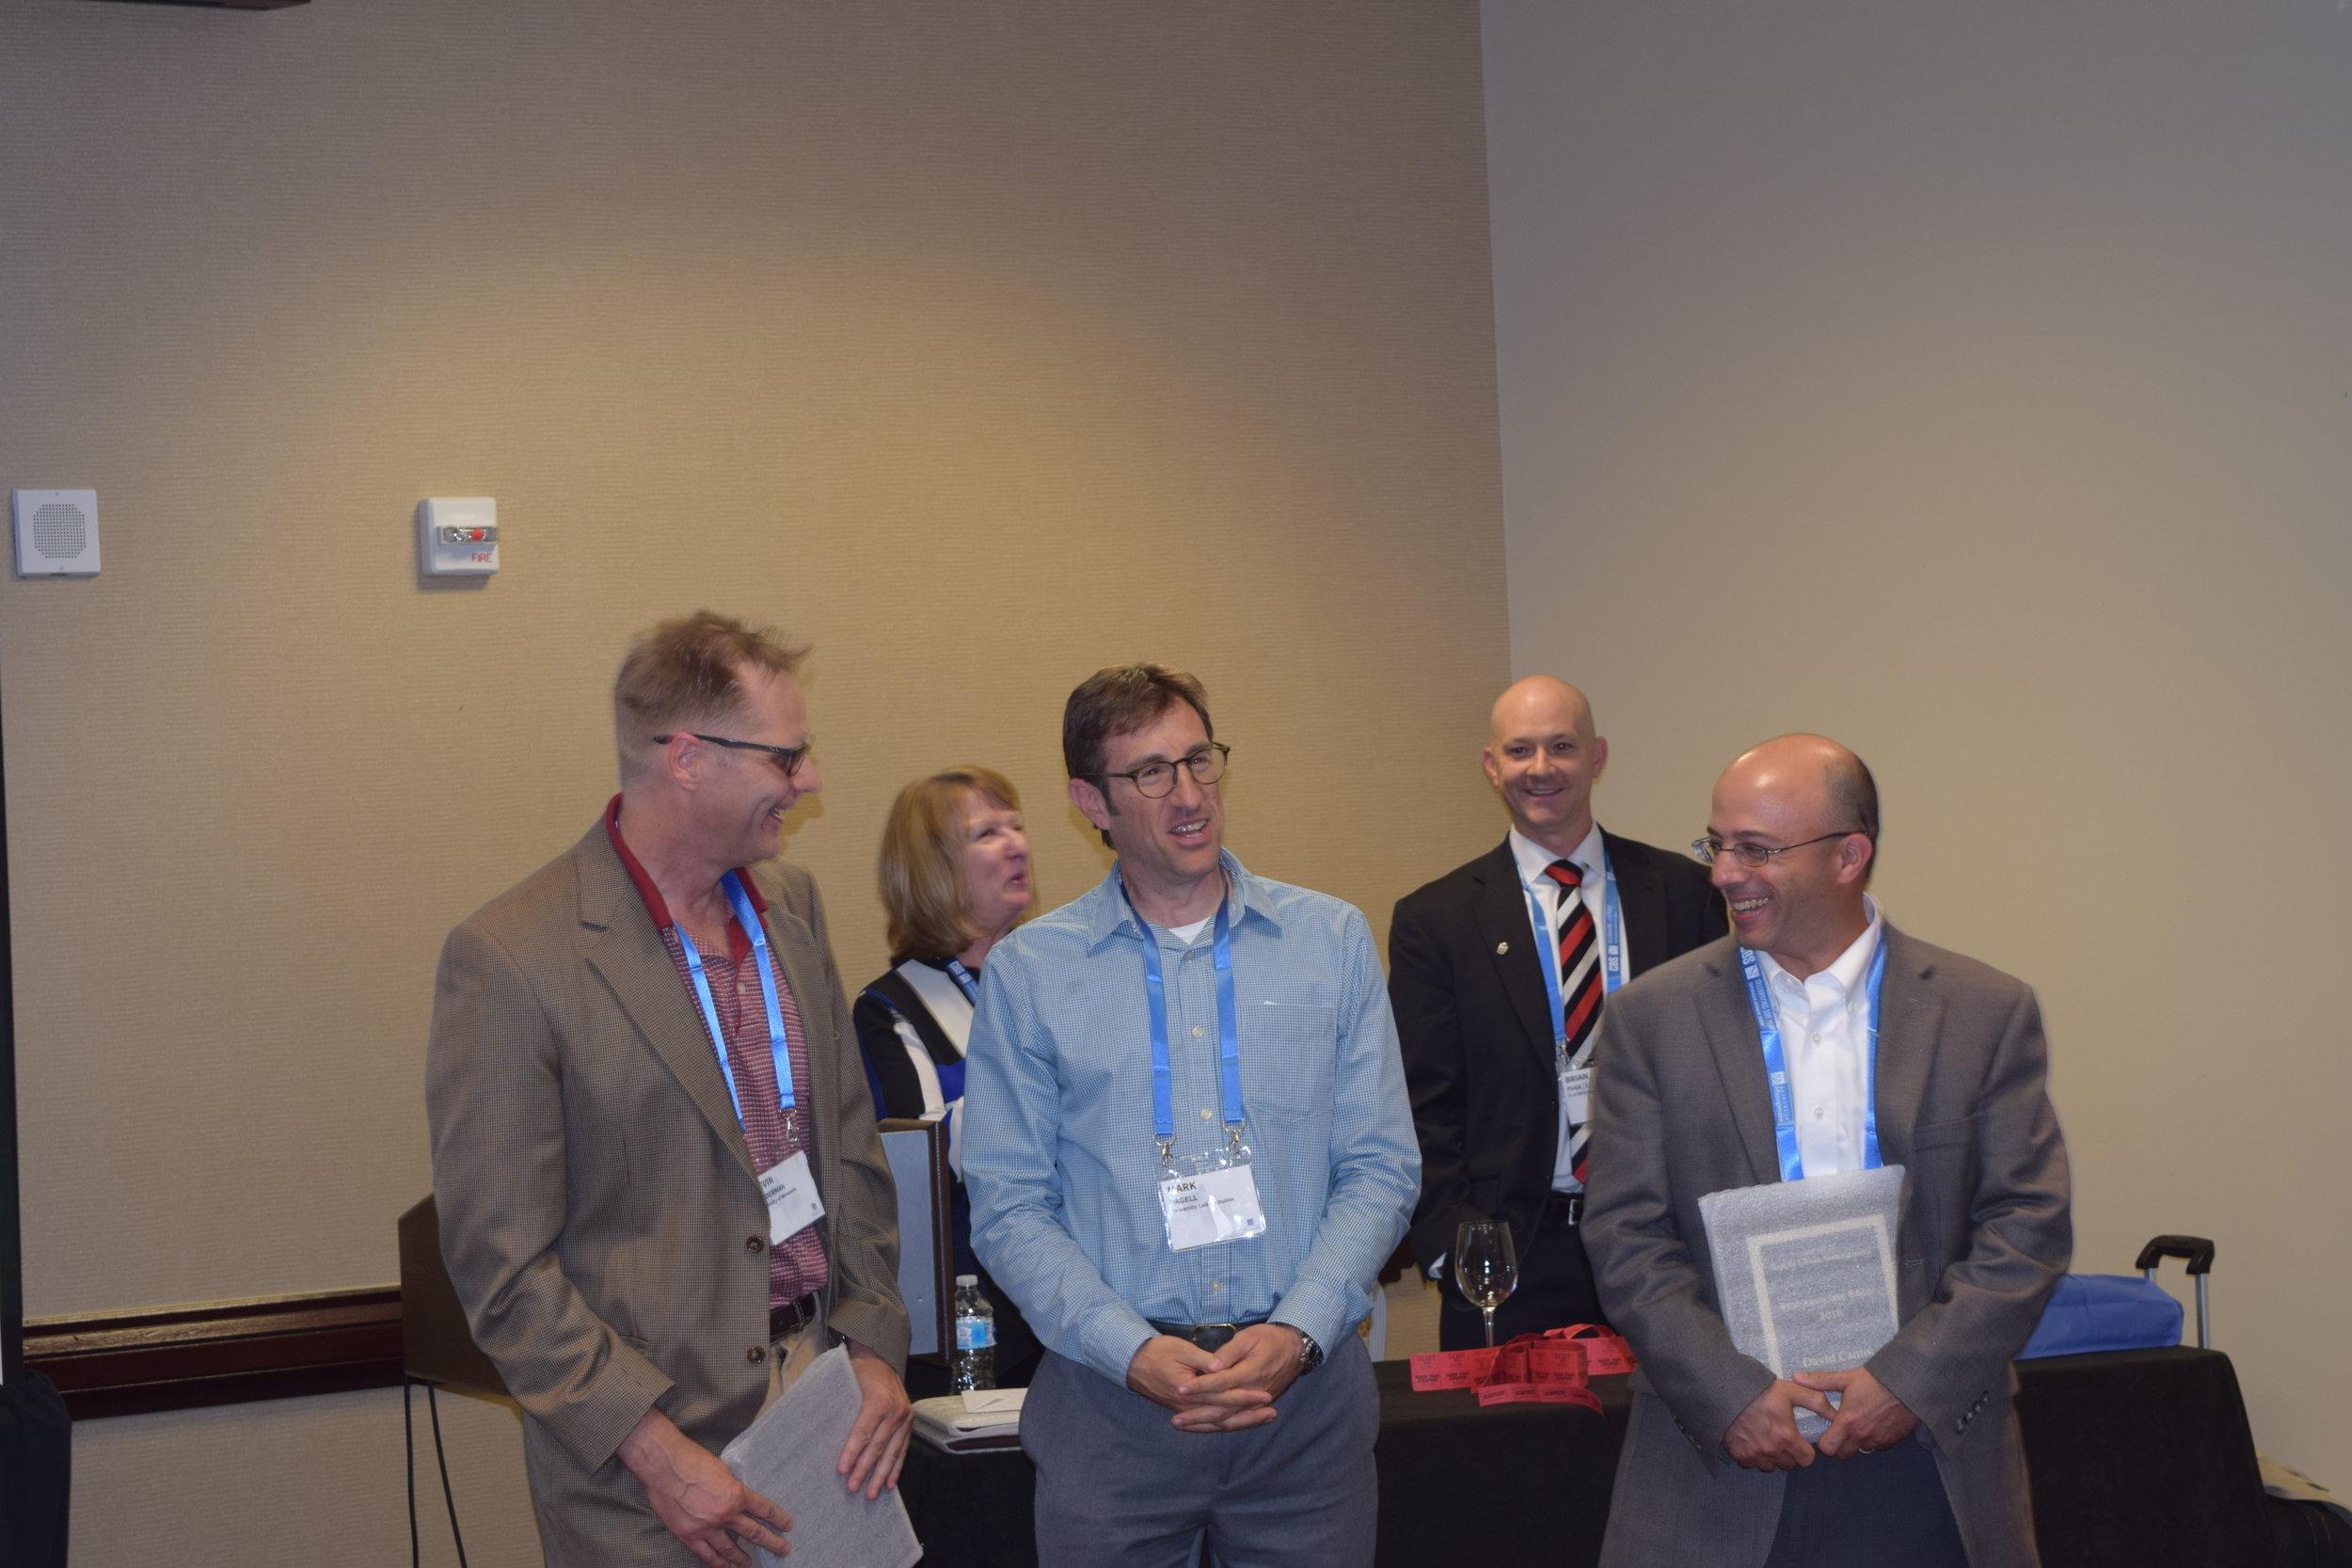 Professor Kevin Linderman and Professor David Cantor